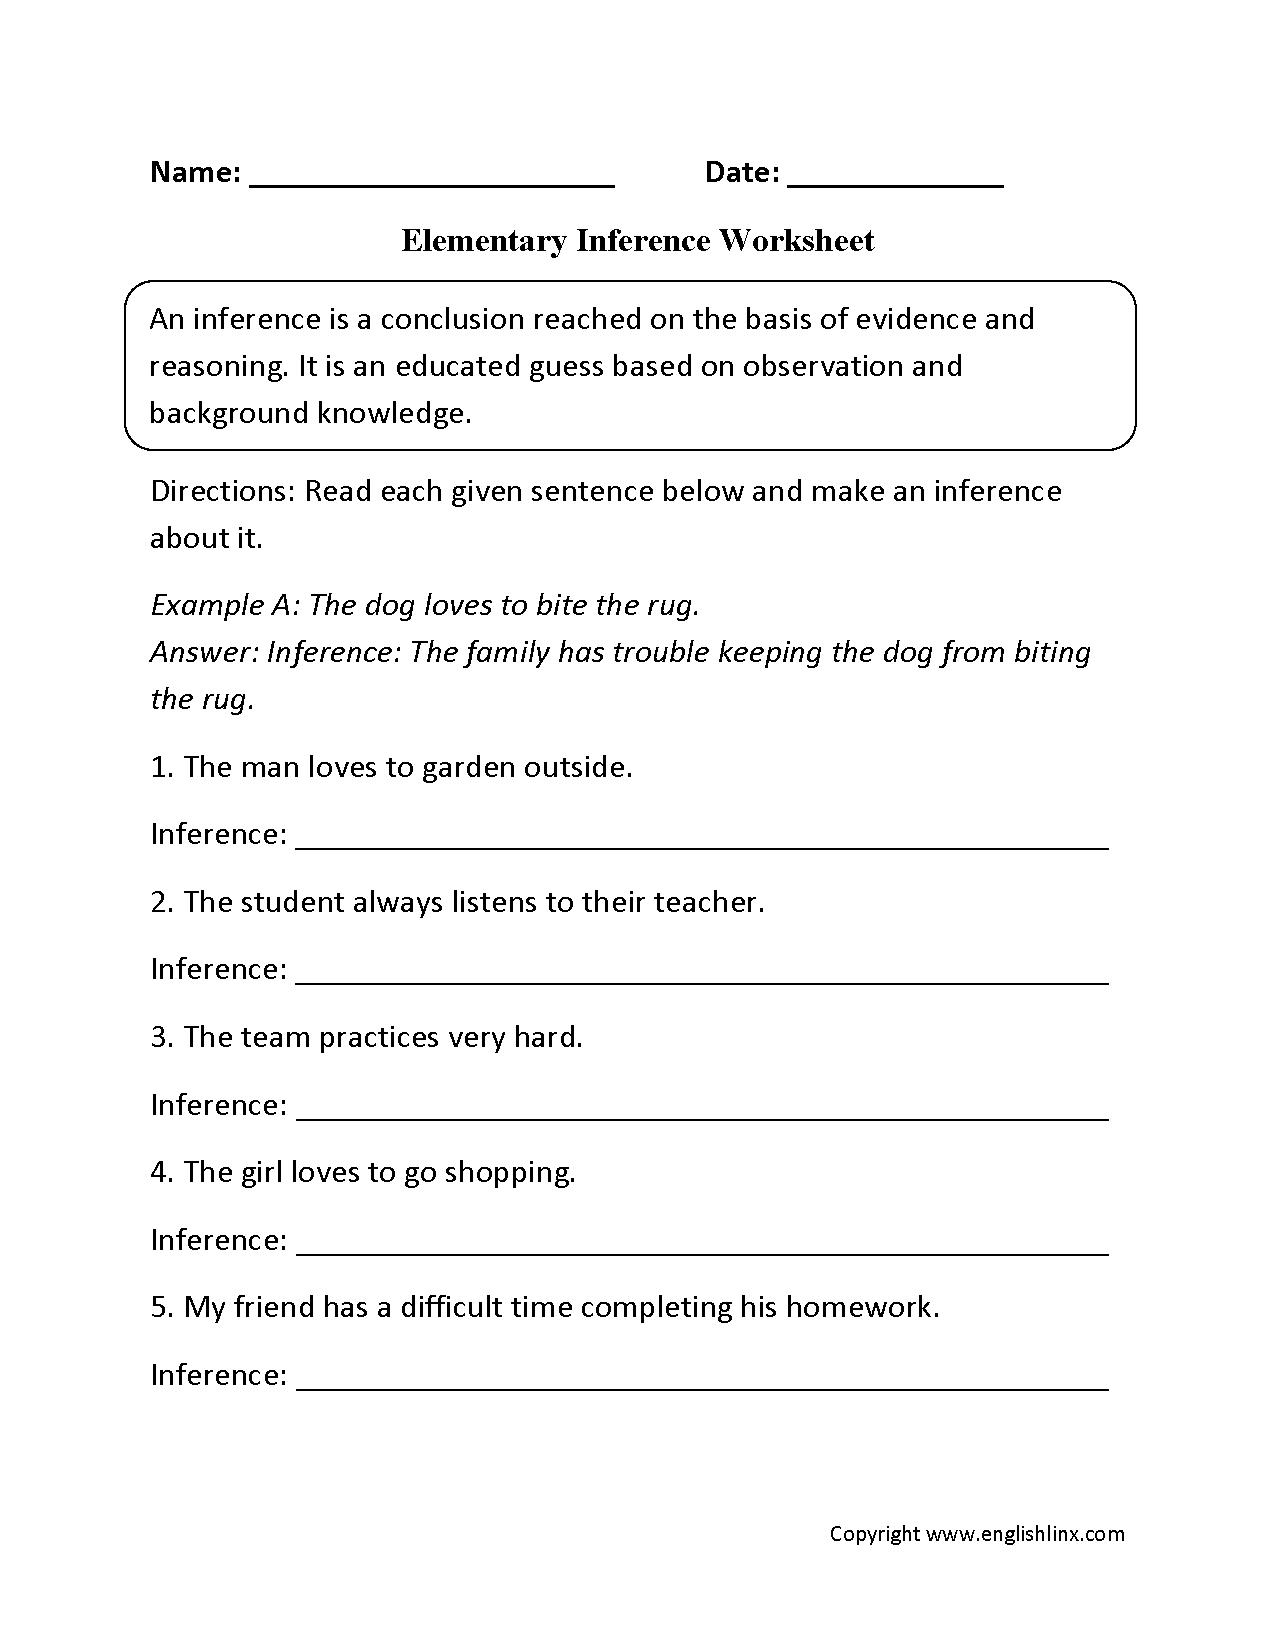 Making Inference Worksheets 5th Grade The Best Worksheets Image